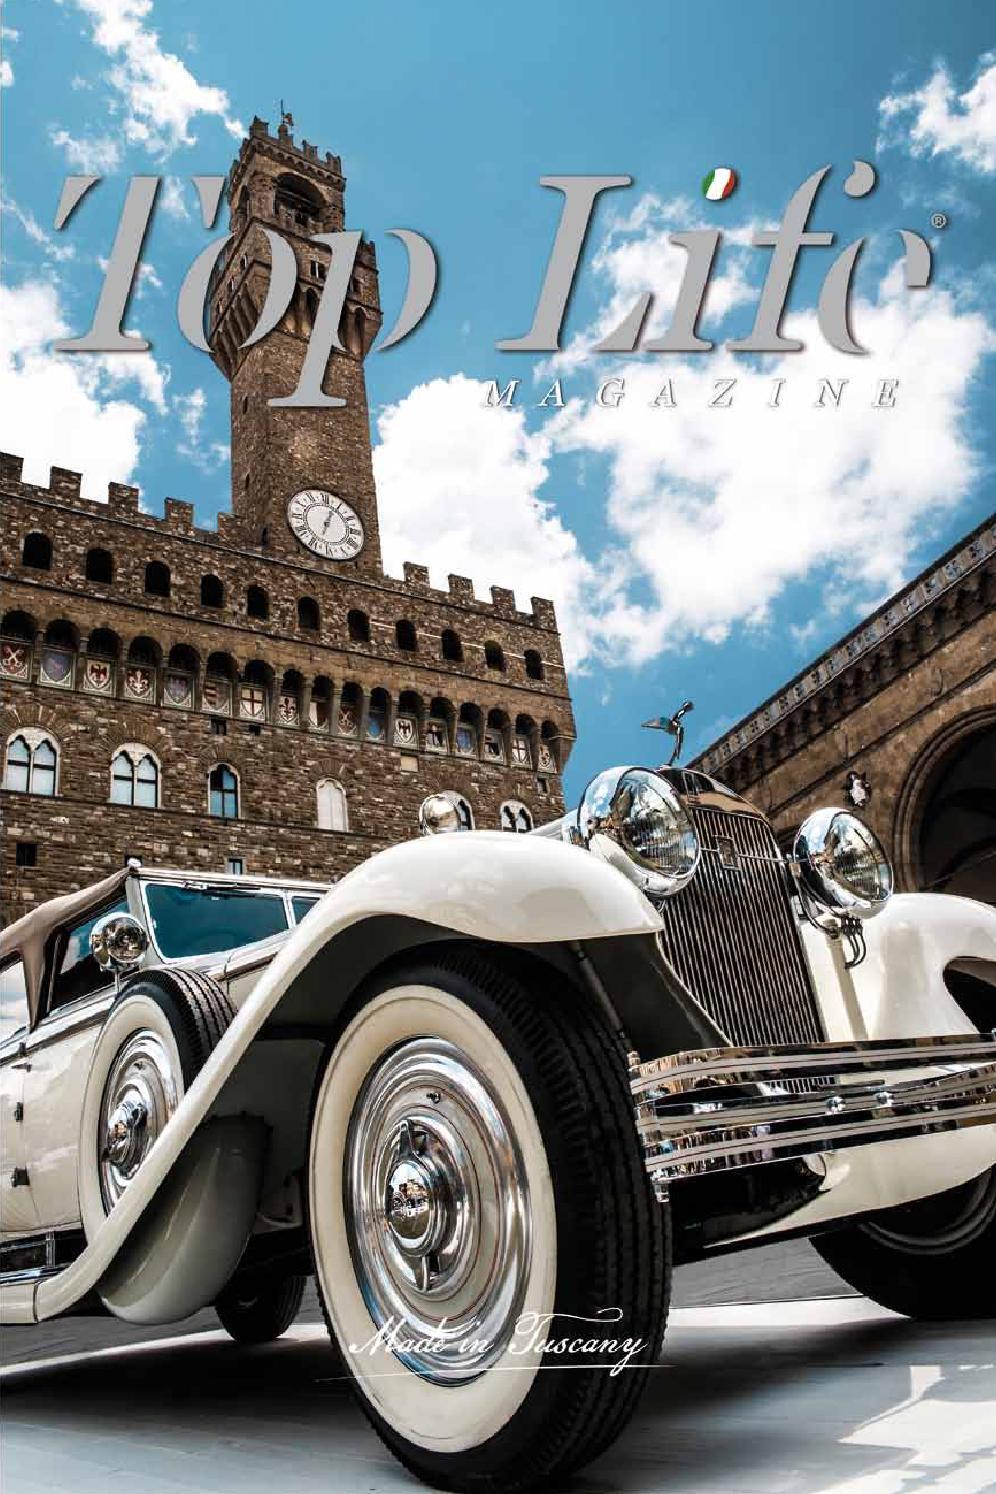 Top life magazine  04 by Top Life magazine - issuu 607607bcb02